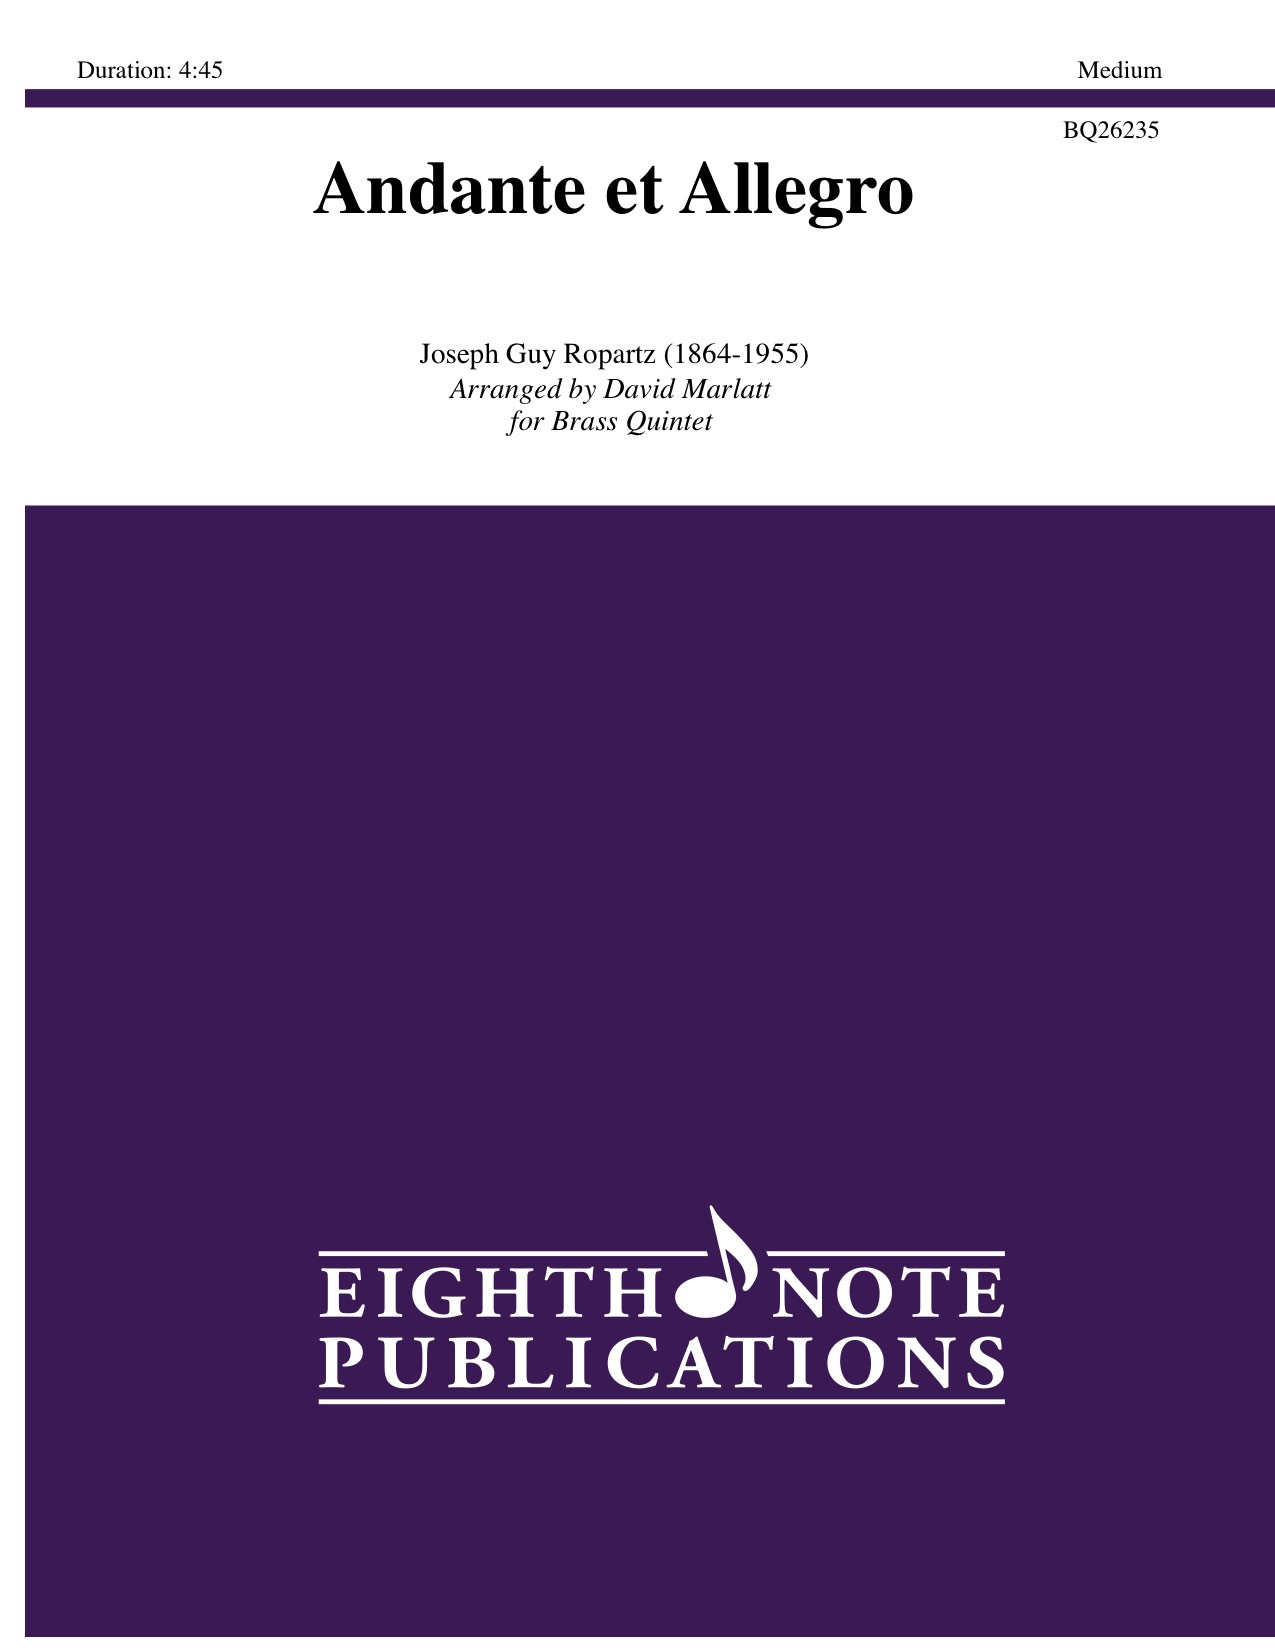 Andante et Allegro - Joseph Guy Ropartz